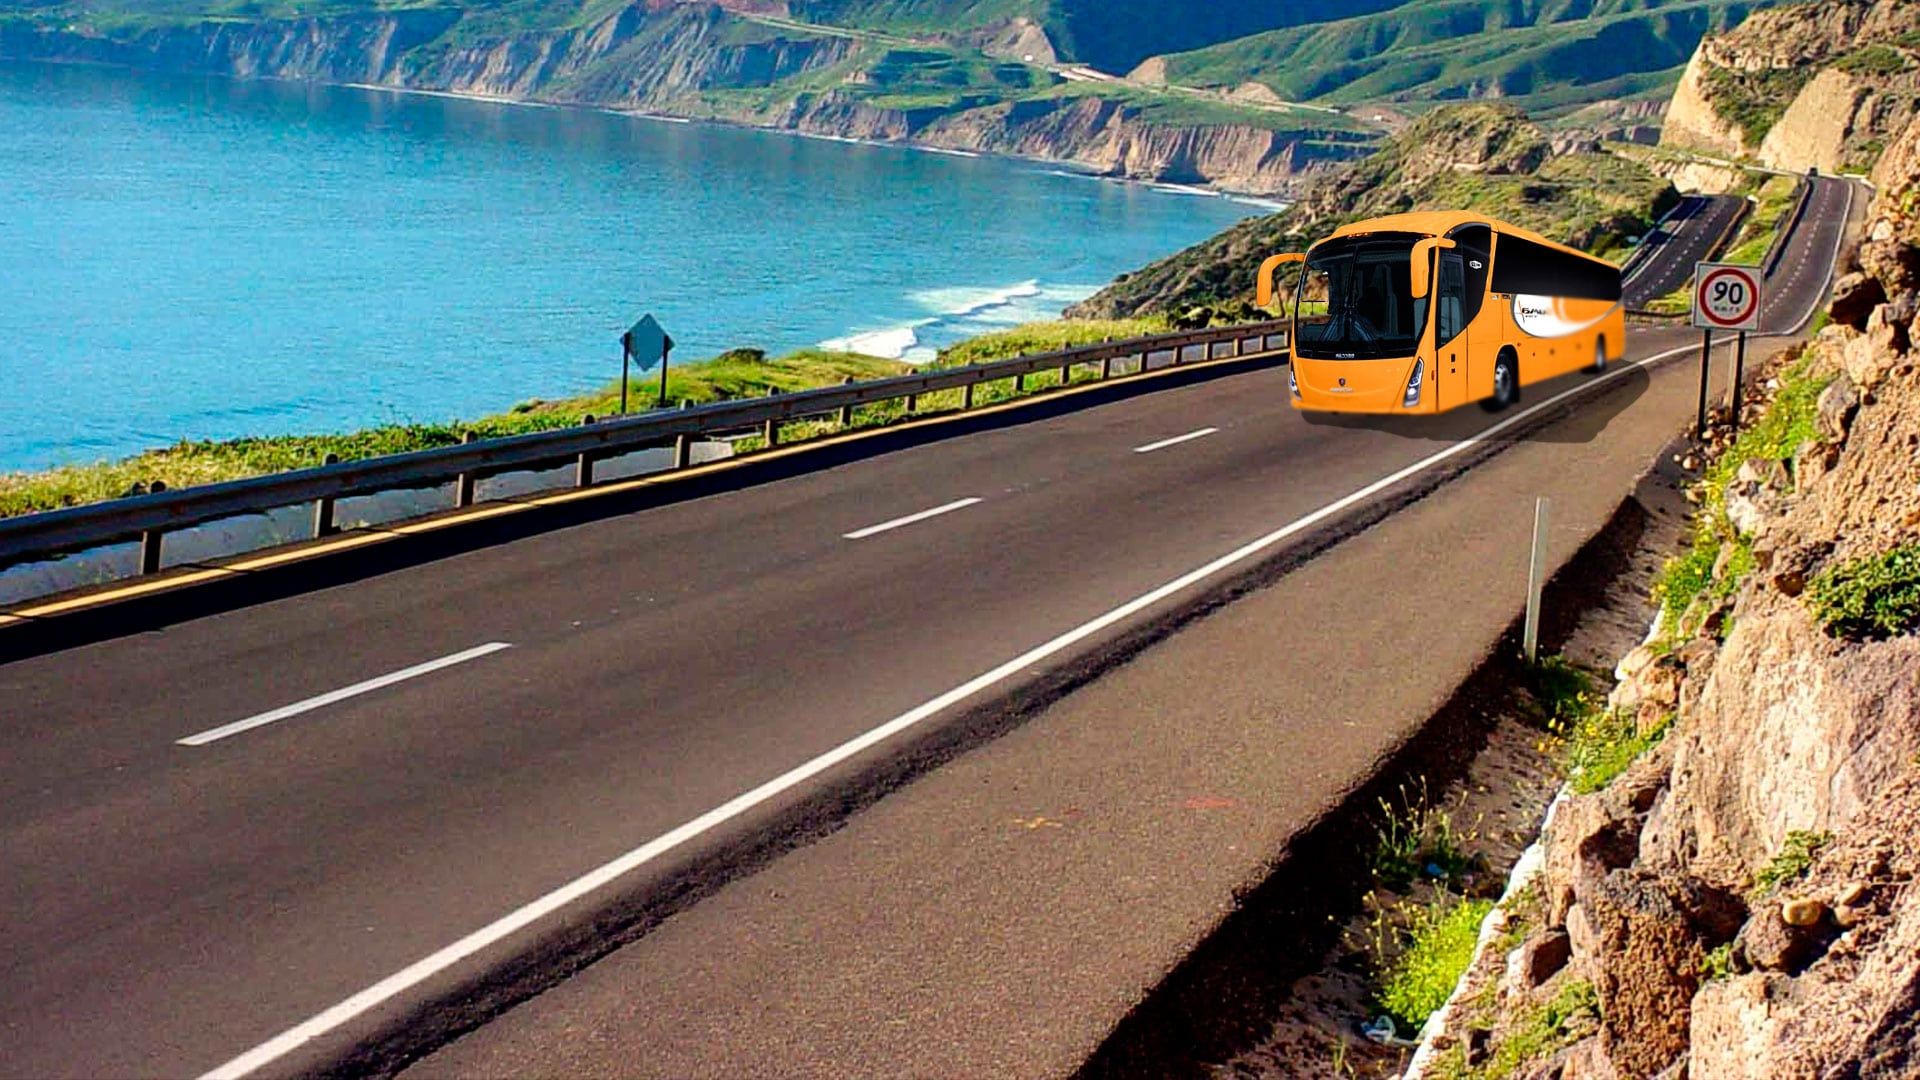 Transporte turistico, ejecutivo Guadalajara